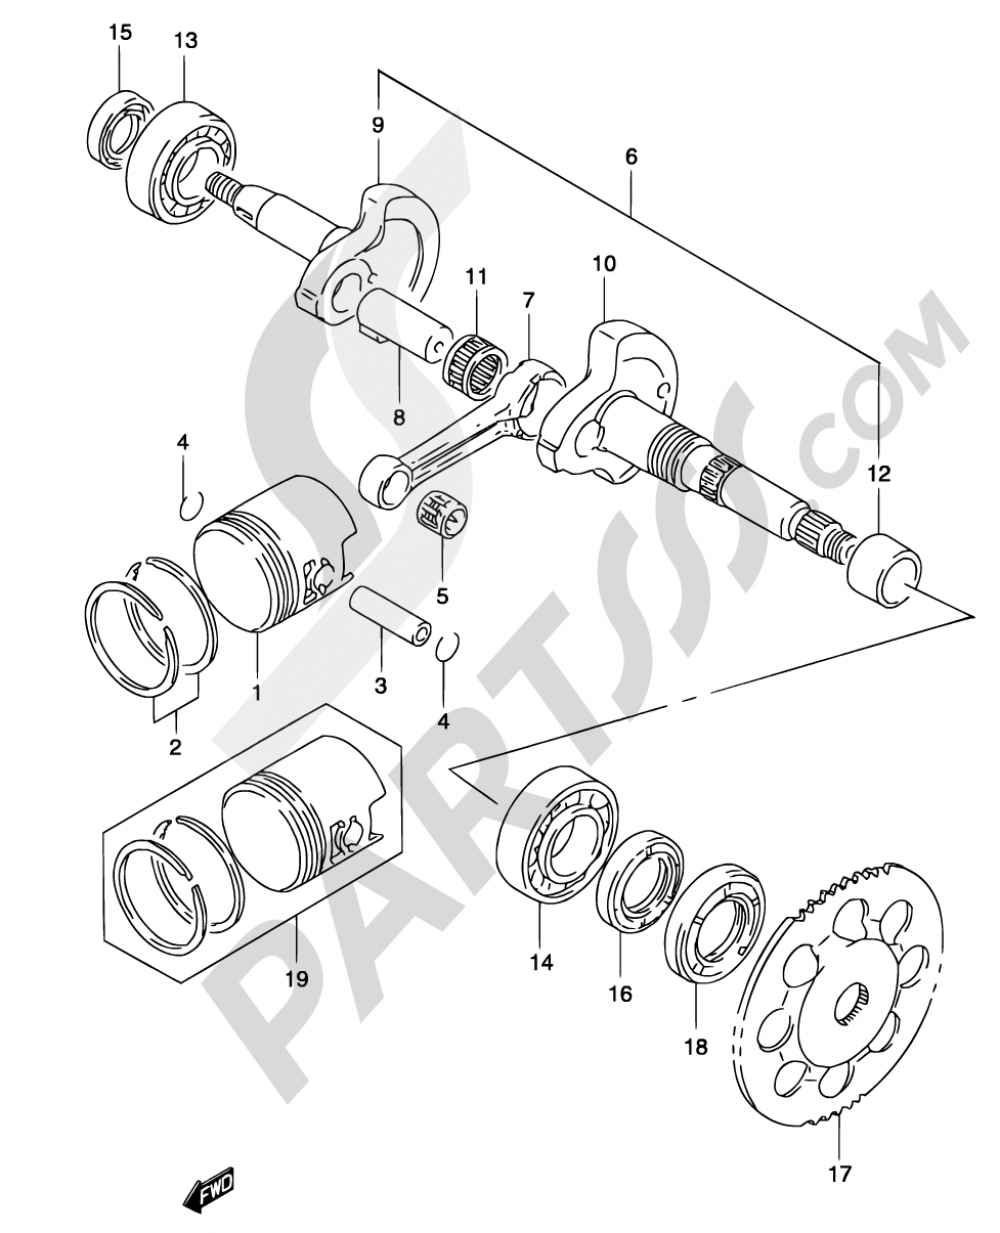 2001 Katana Wiring Diagram | Wiring Diagram on 2001 steering diagram, 2001 fuel system diagram, 2001 fuse diagram, 2001 transmission diagram, 2001 parts diagram,